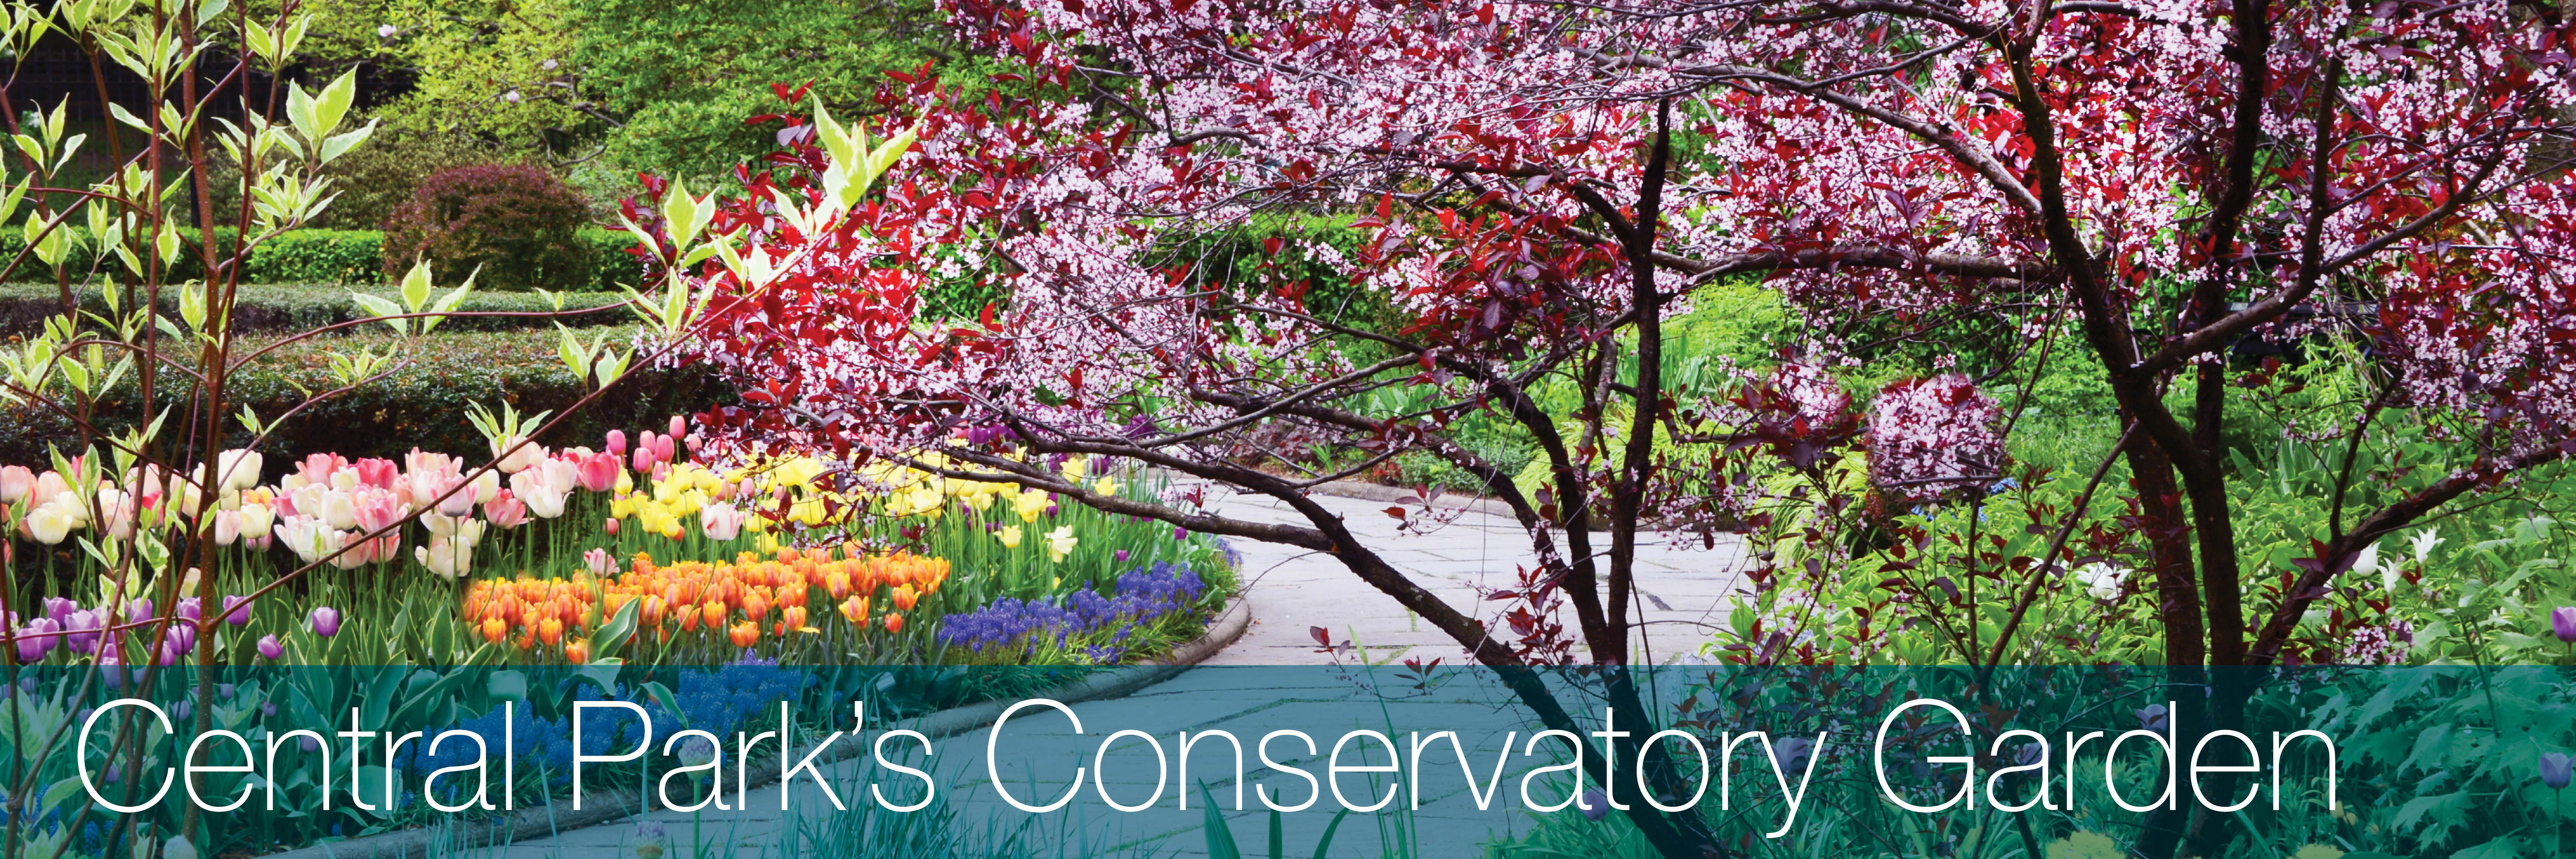 central-park-conservatory-garden-1